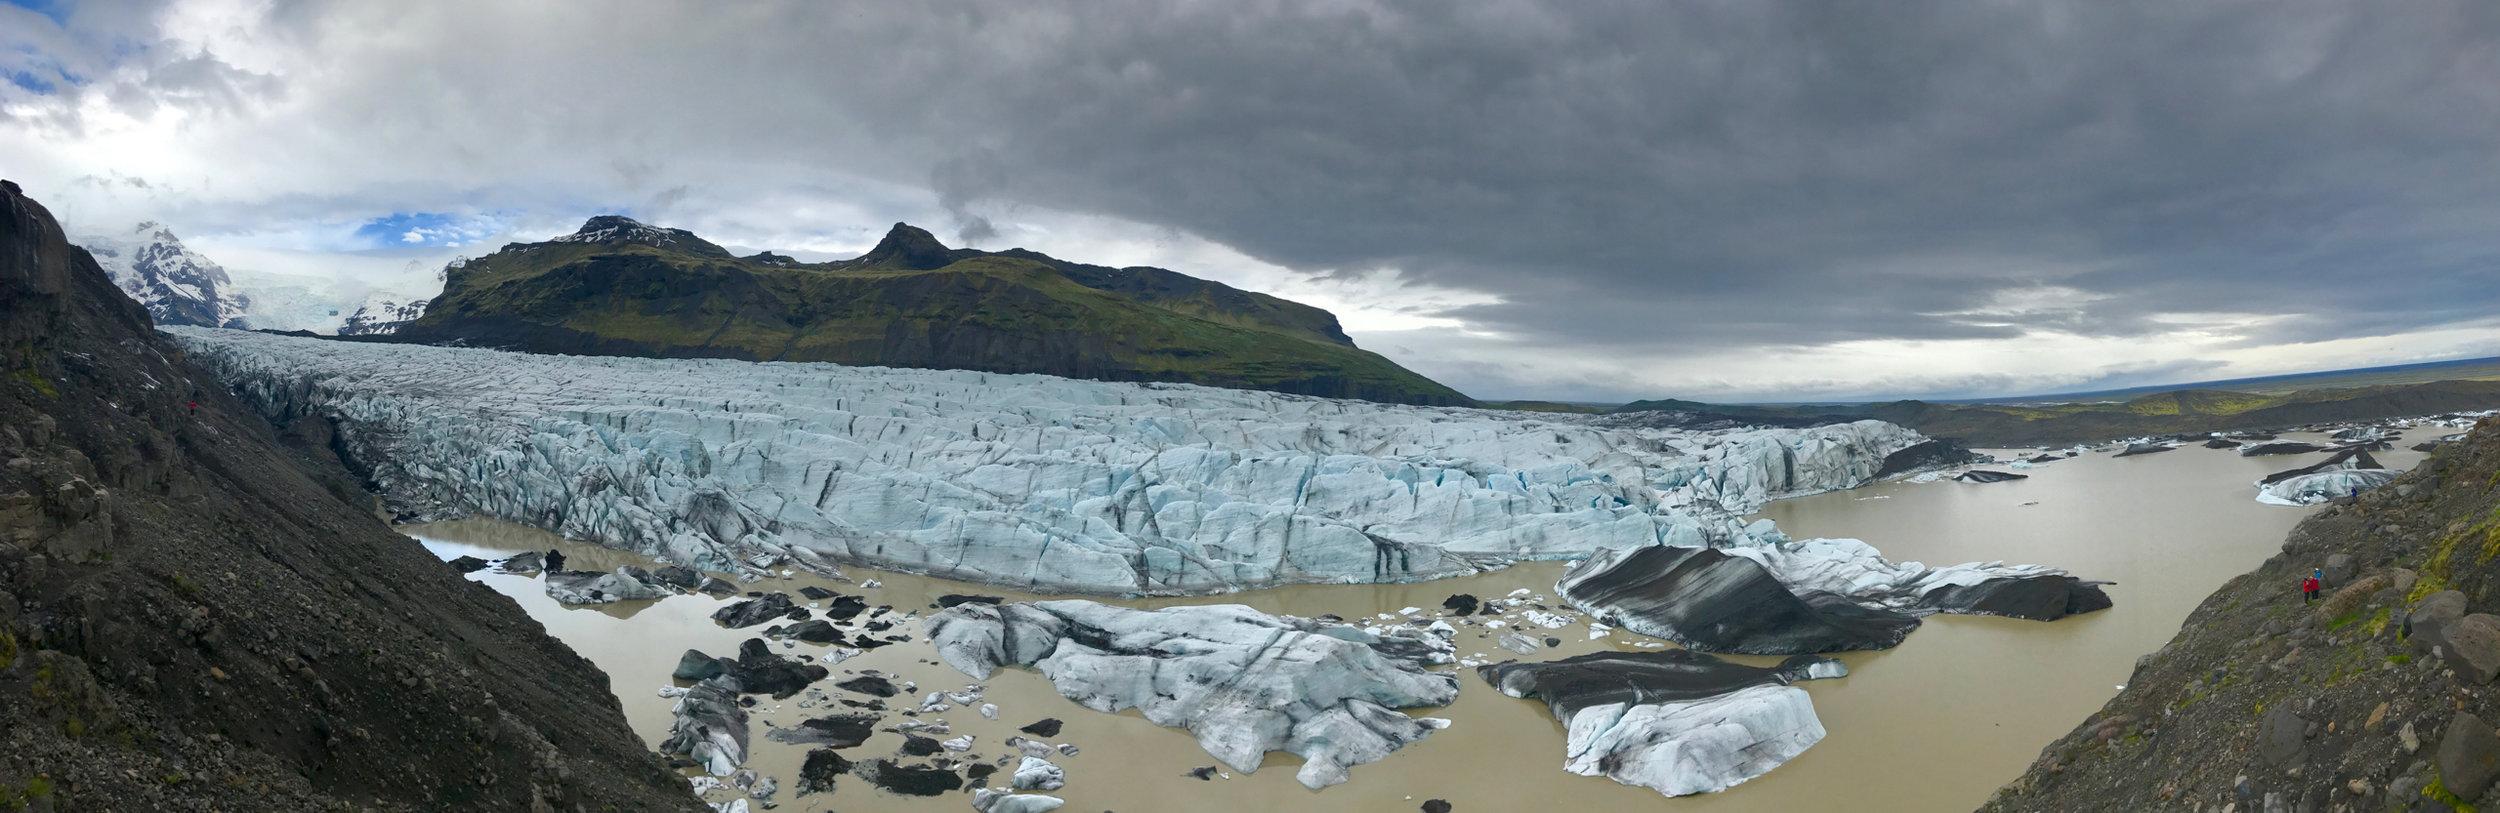 Svinafelljokull glacier